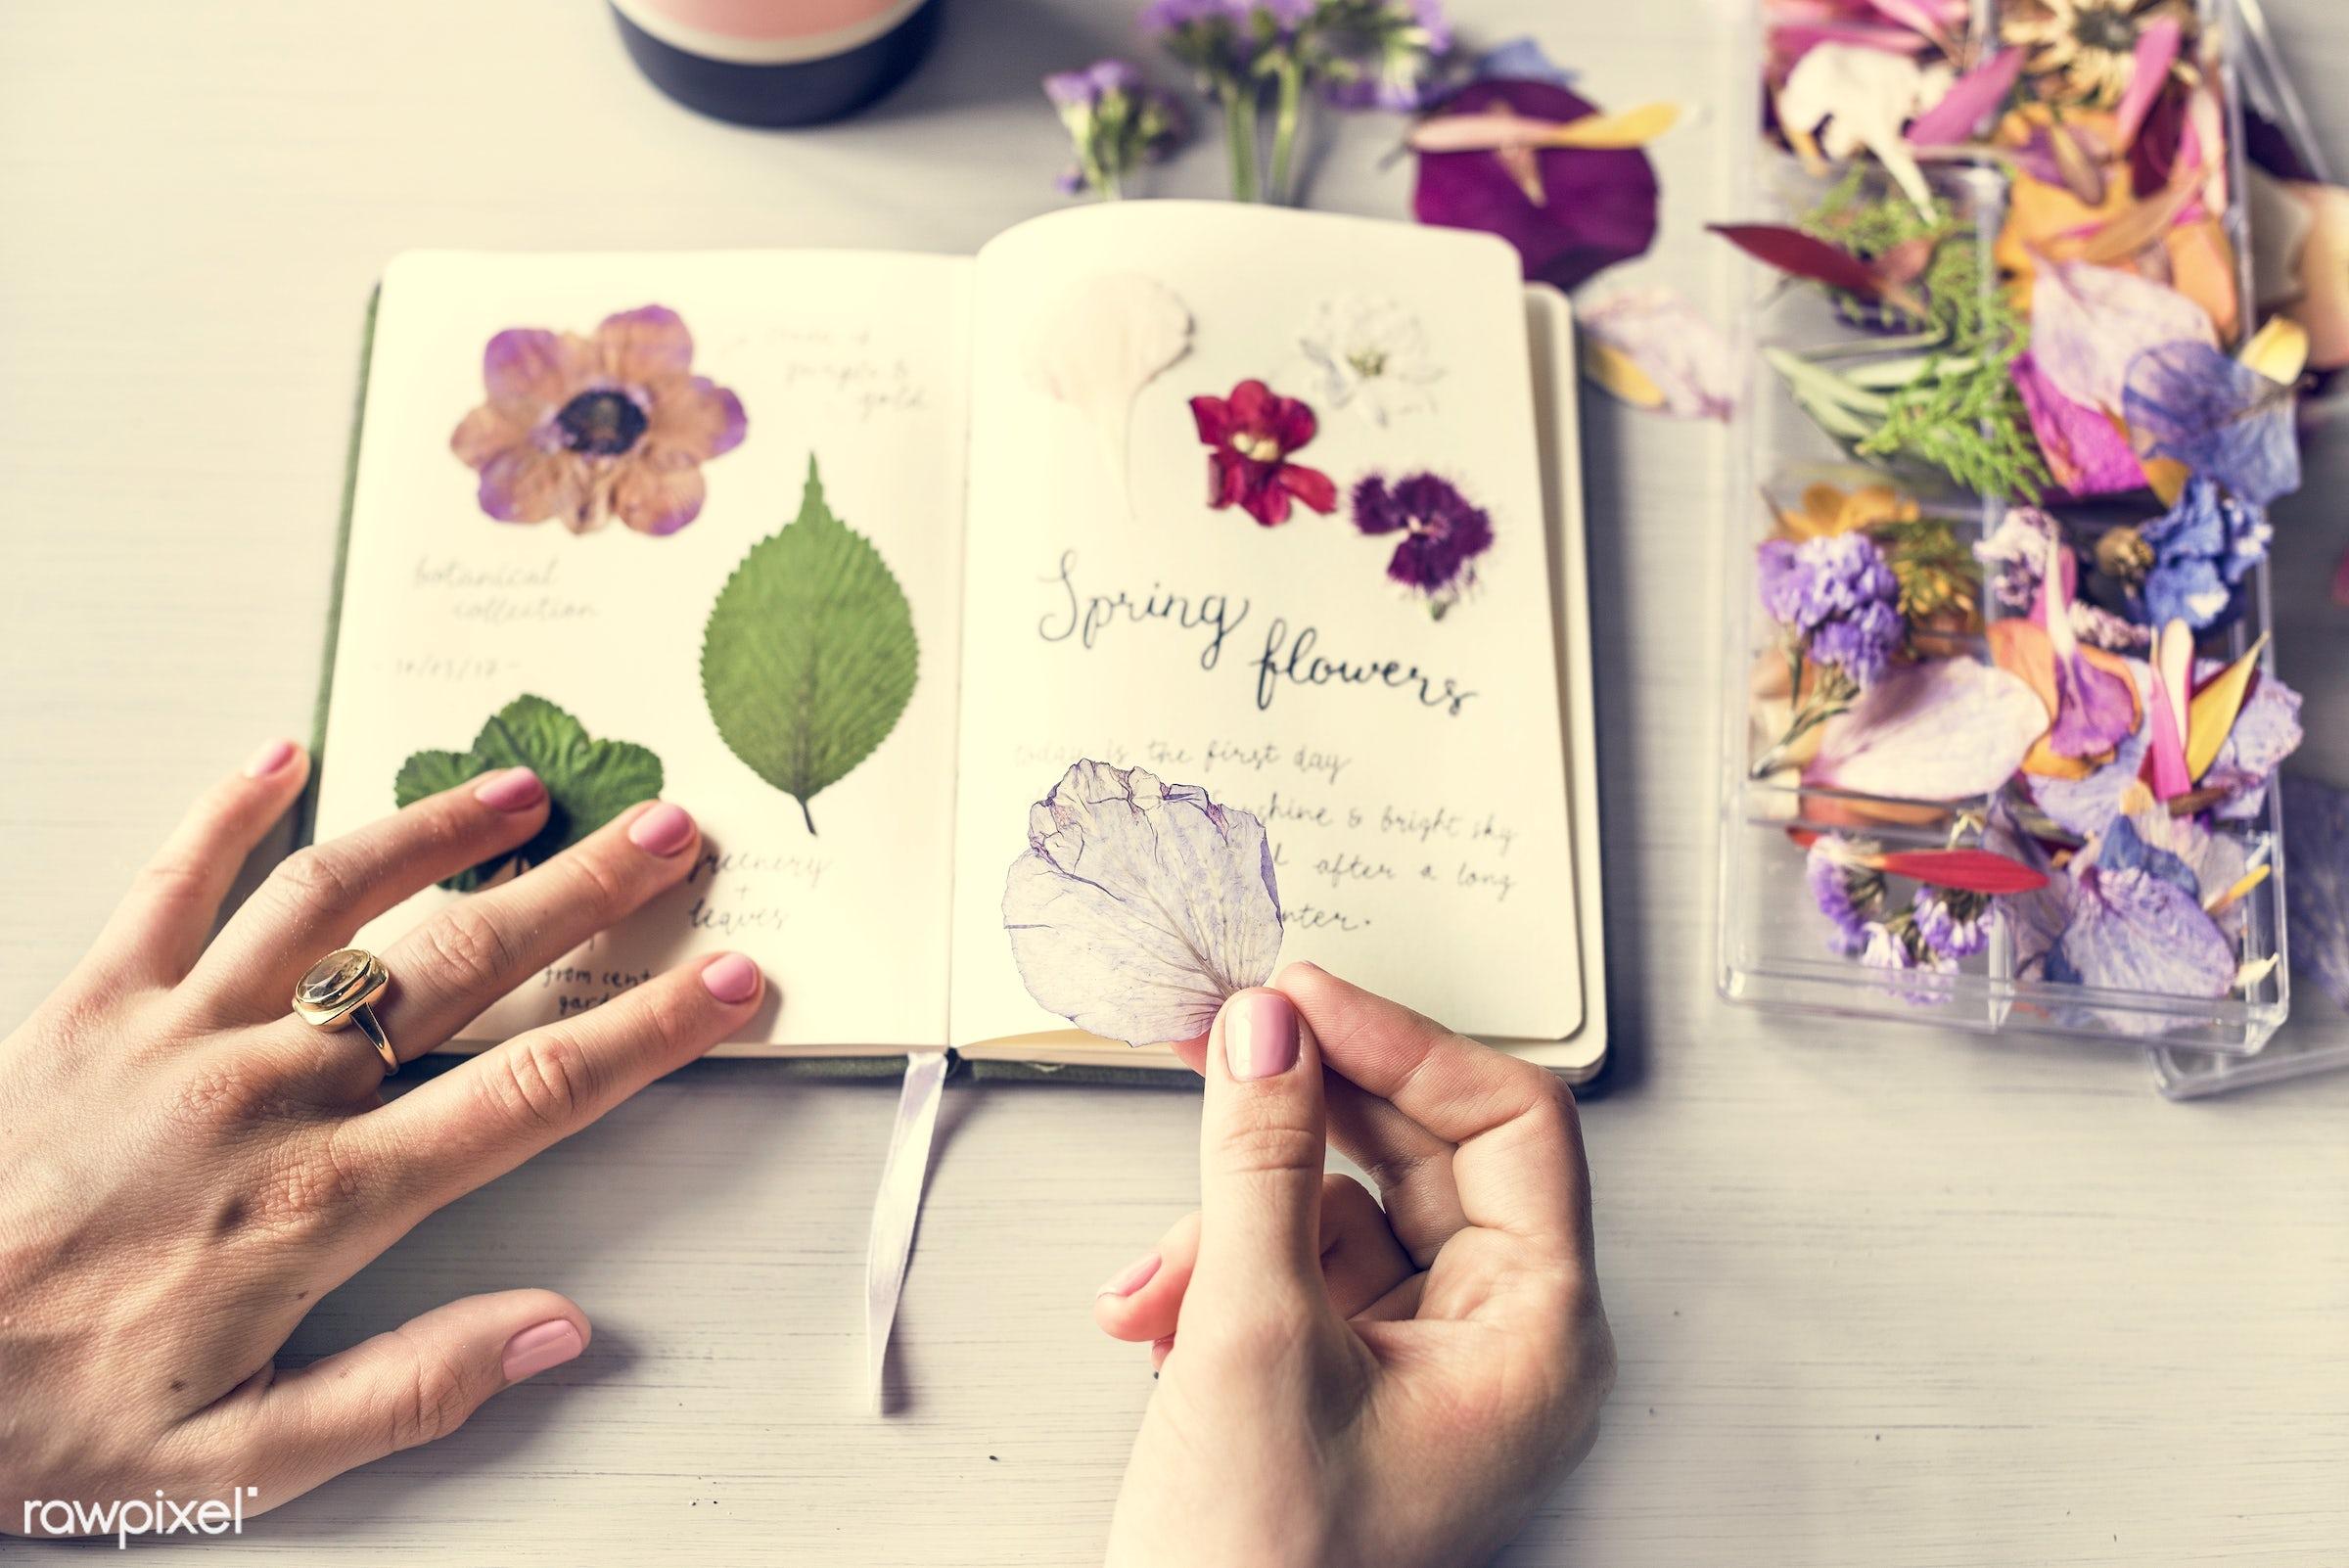 old, diary, decorative, botany, set, album, plants, botanic, collection, leaf, spring, romance, nature, fresh, flower, wild...